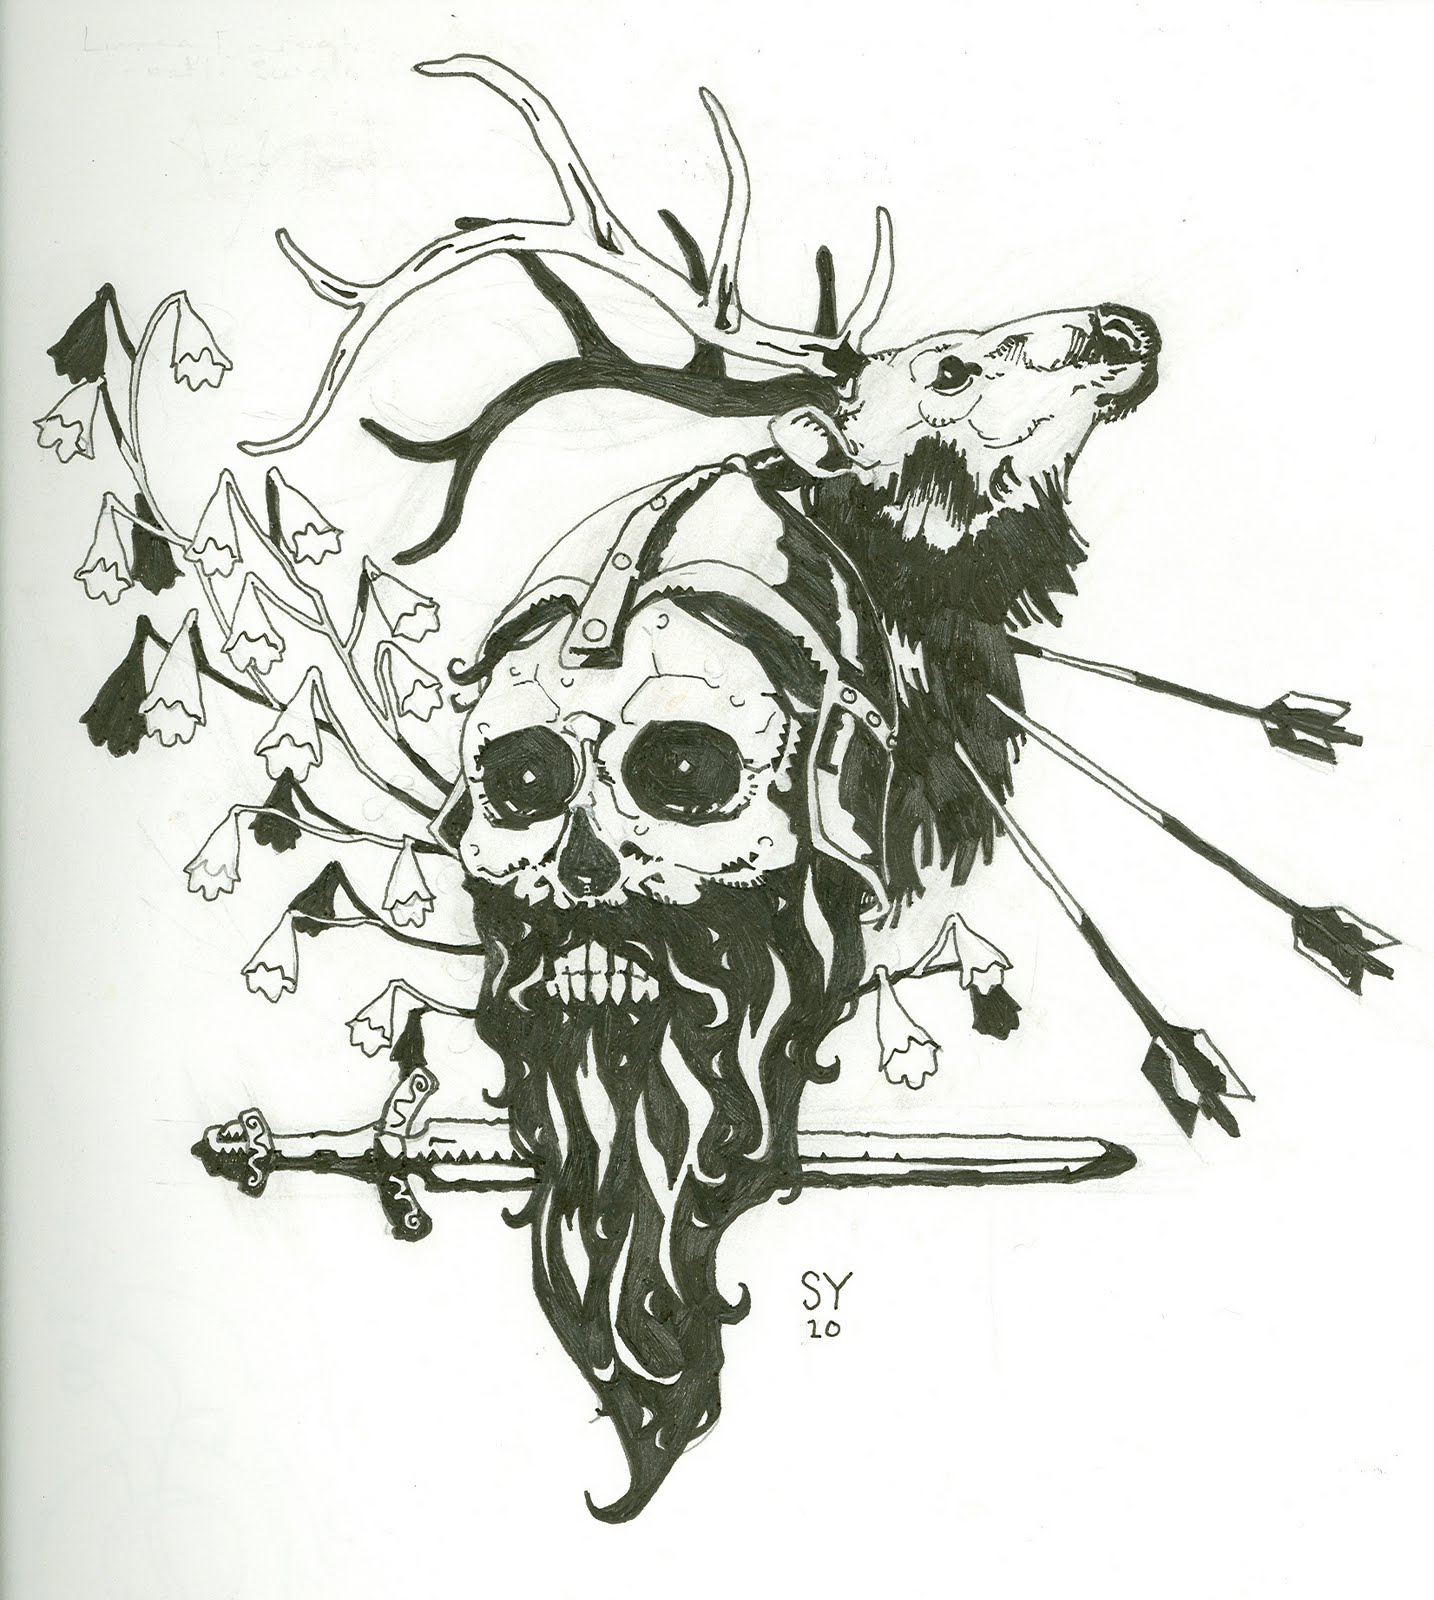 Viking Symbols Of Invincibility 113155 Cours Particuliers Domicile